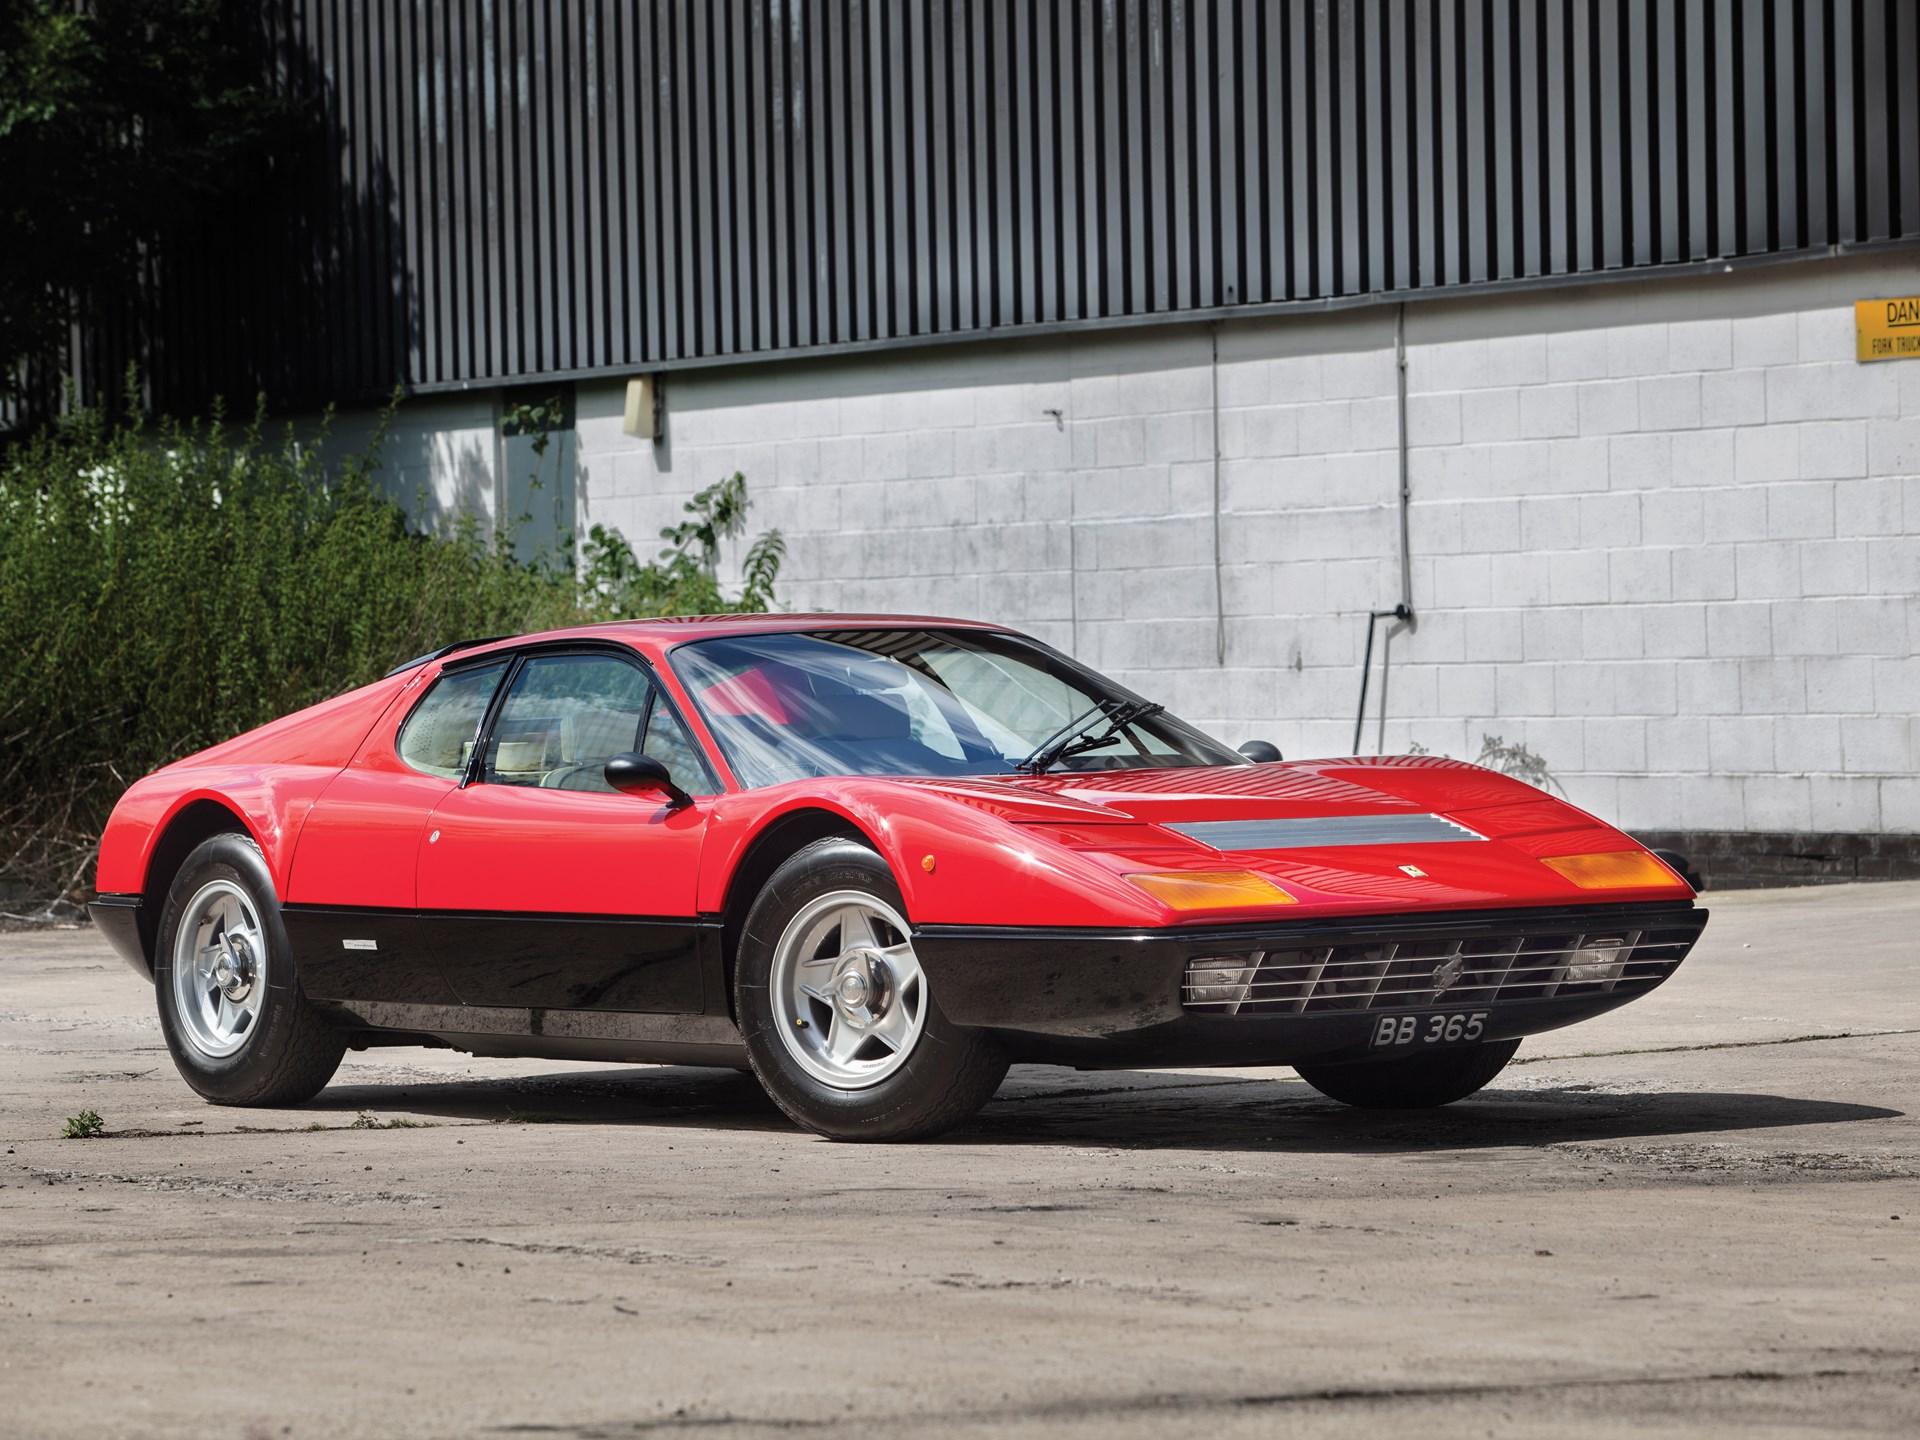 1974 Ferrari 365 GT4 BB by Scaglietti | London 2015 | RM Sotheby's